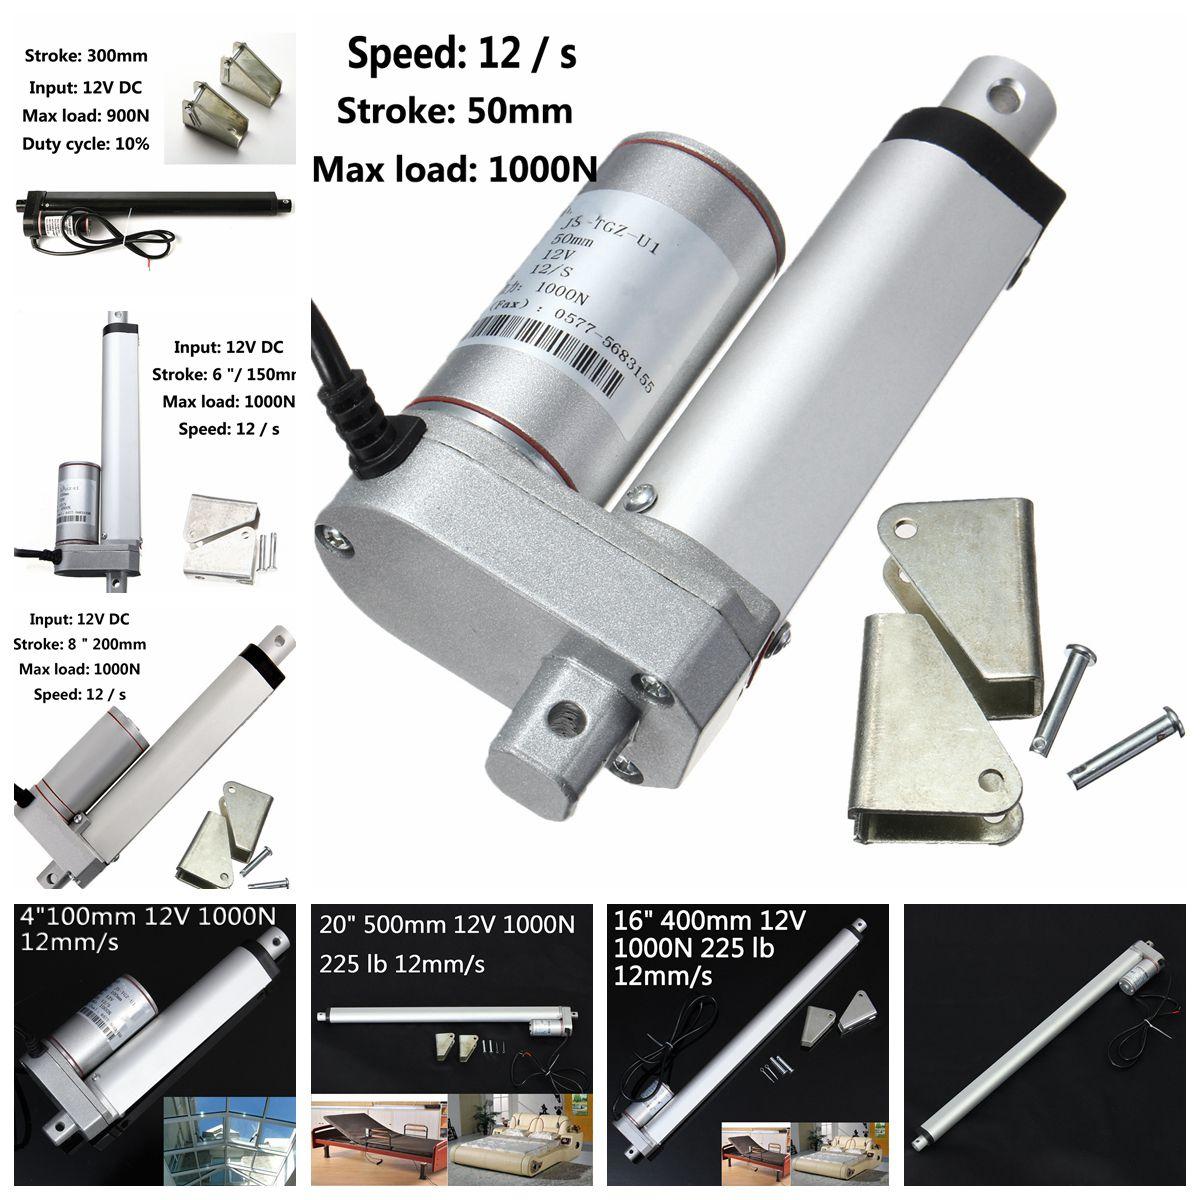 DC 12V Electric Linear Actuator 1000N 50-500mm Stroke Linear Motor Controller 12mm/s Electric Bracket 2/4/6/8/16/20DC 12V Electric Linear Actuator 1000N 50-500mm Stroke Linear Motor Controller 12mm/s Electric Bracket 2/4/6/8/16/20